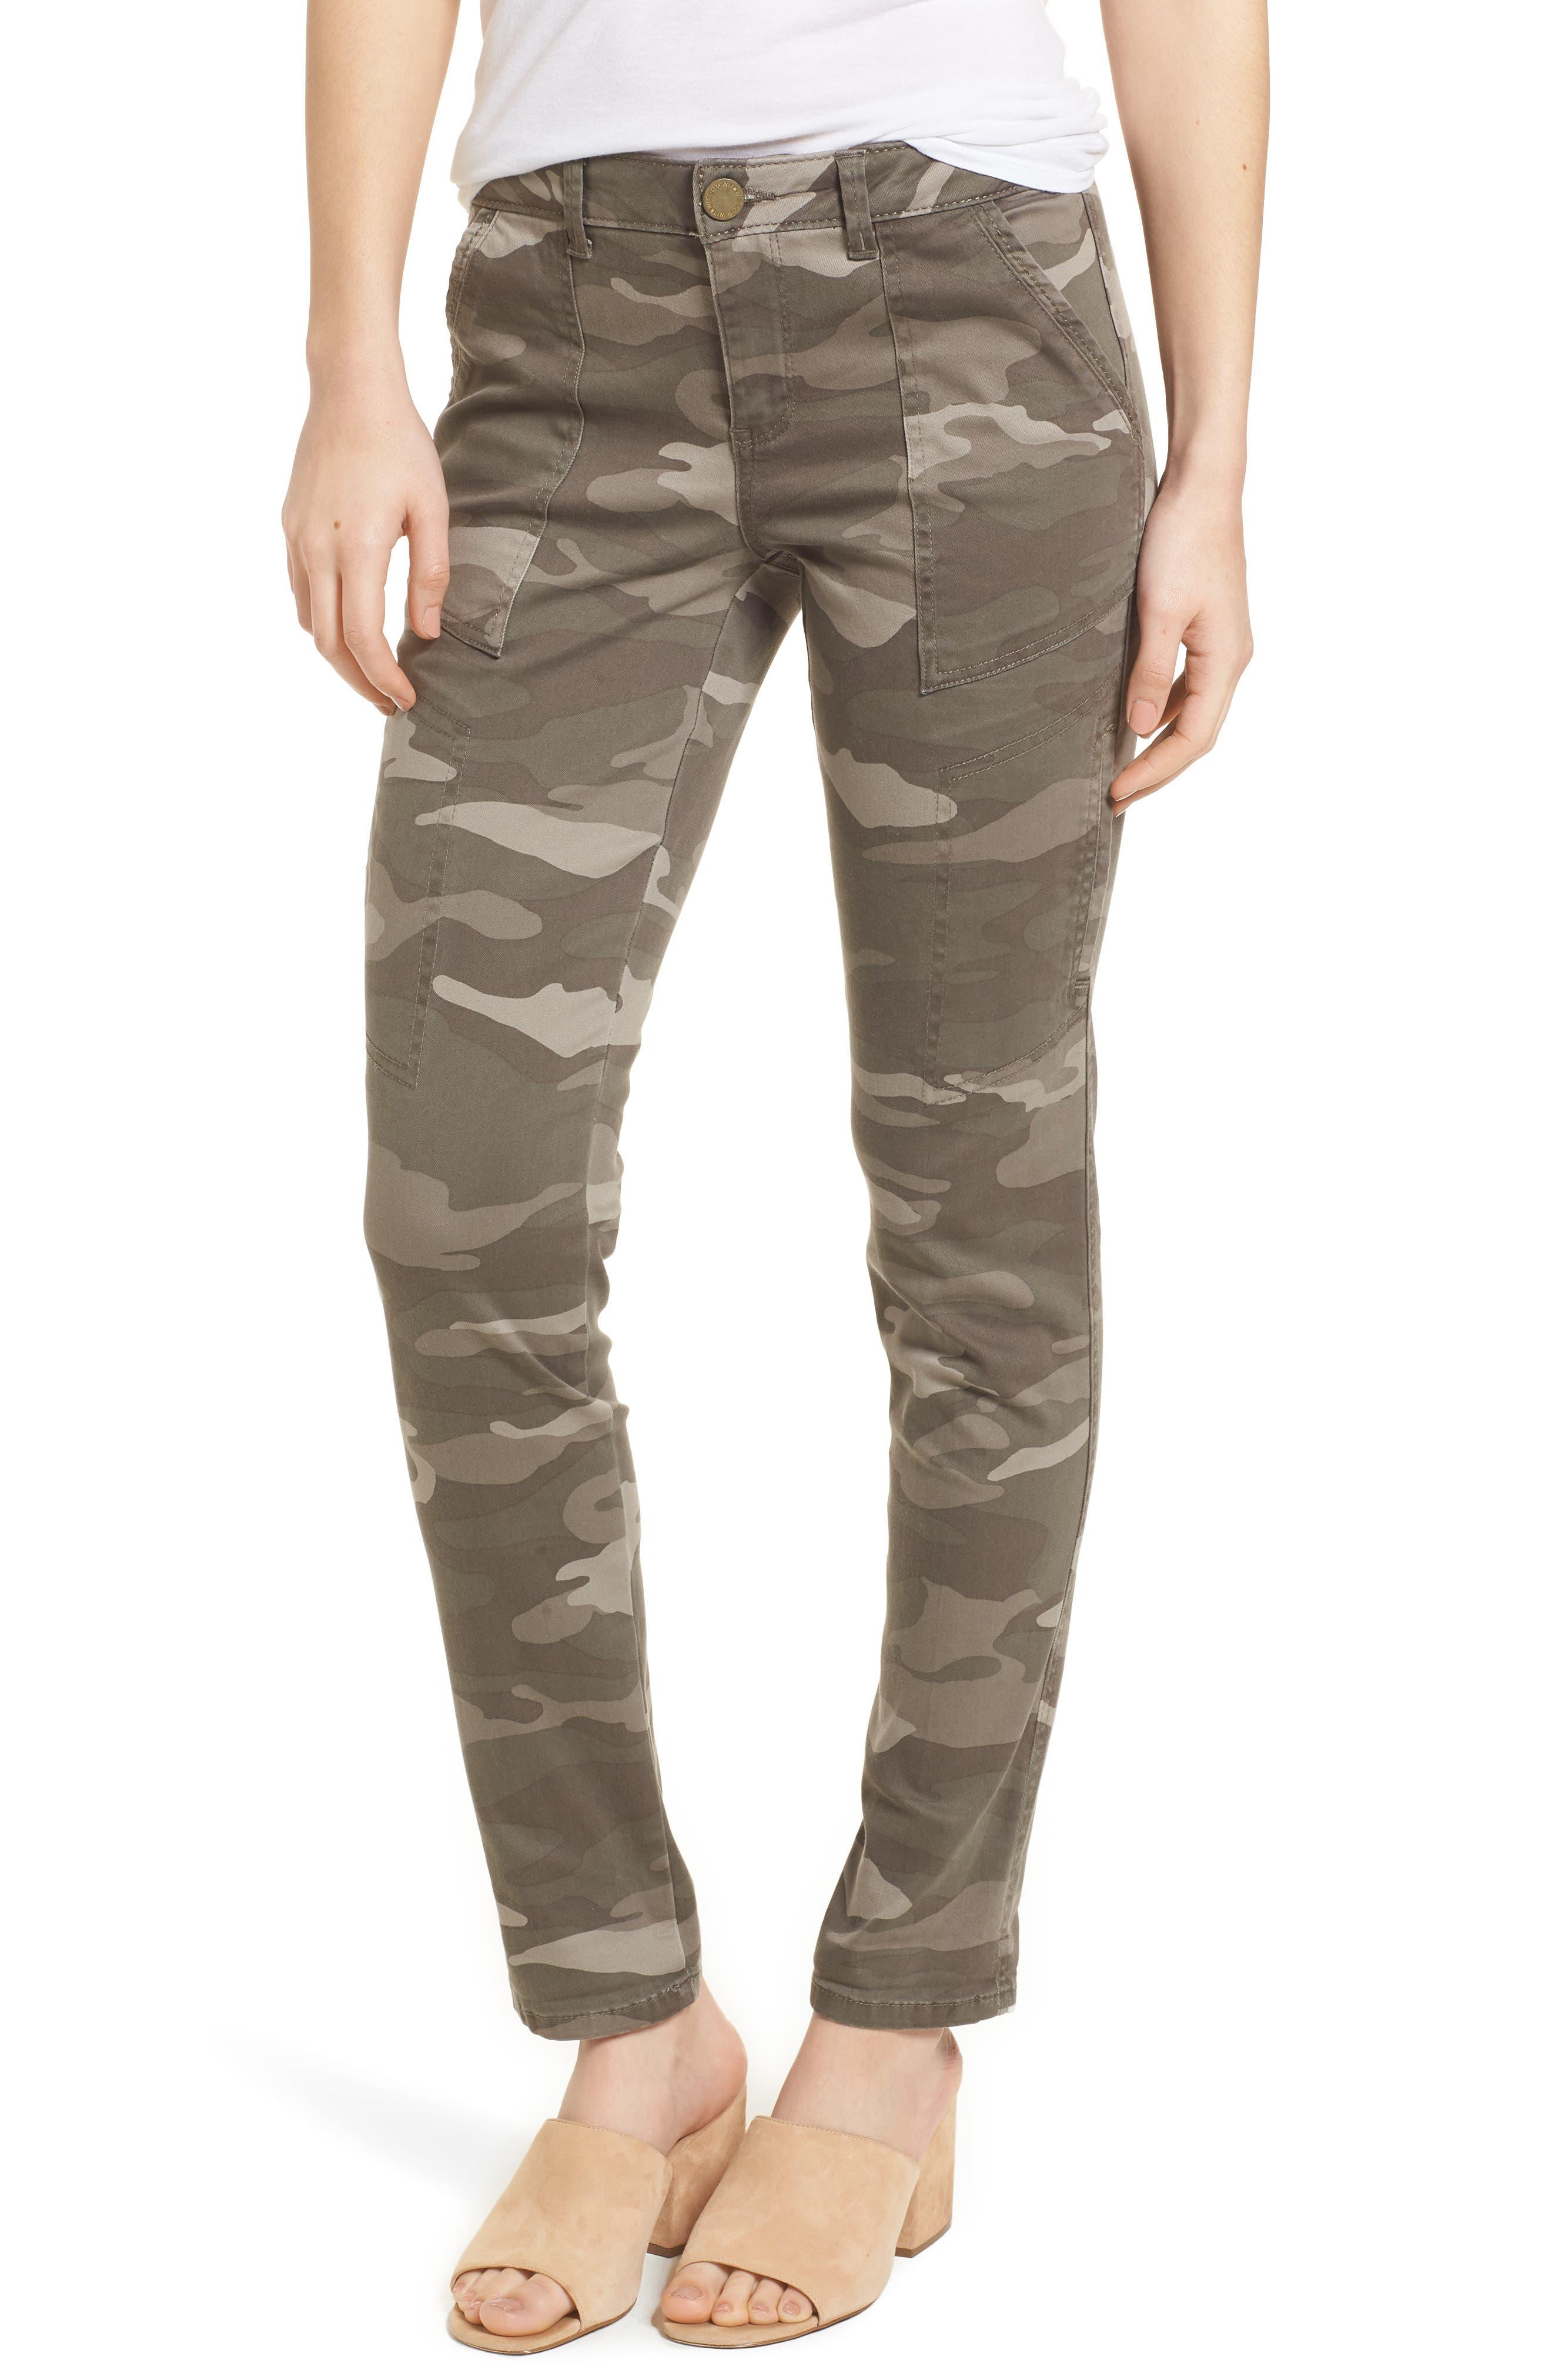 Twill Camo Cargo Pants,                         Main,                         color, 210